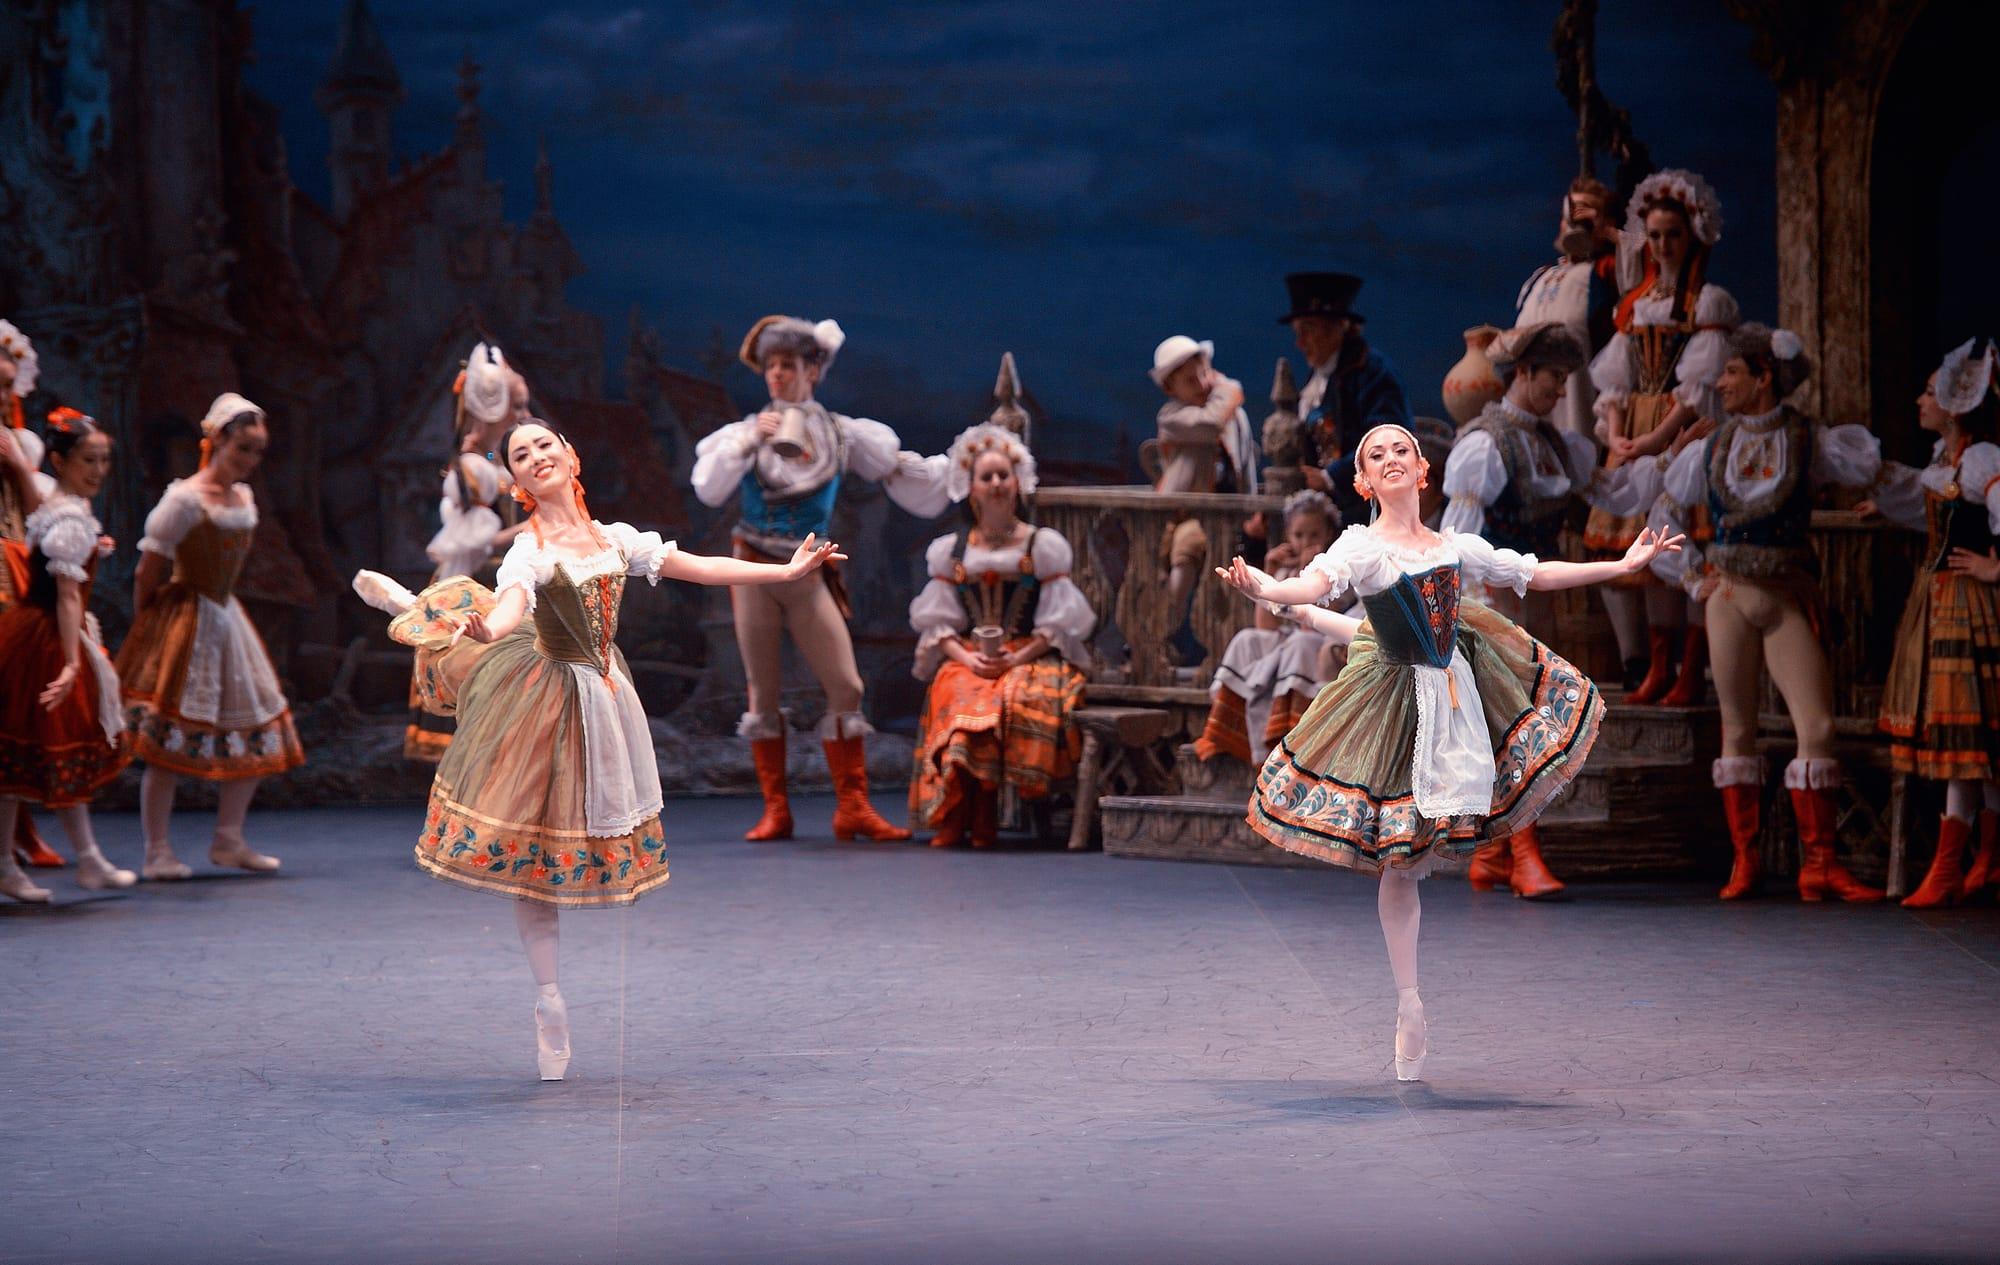 Jung ah Choi and Anjuli Hudson in English National Ballet's Coppelia © Laurent Liotardo